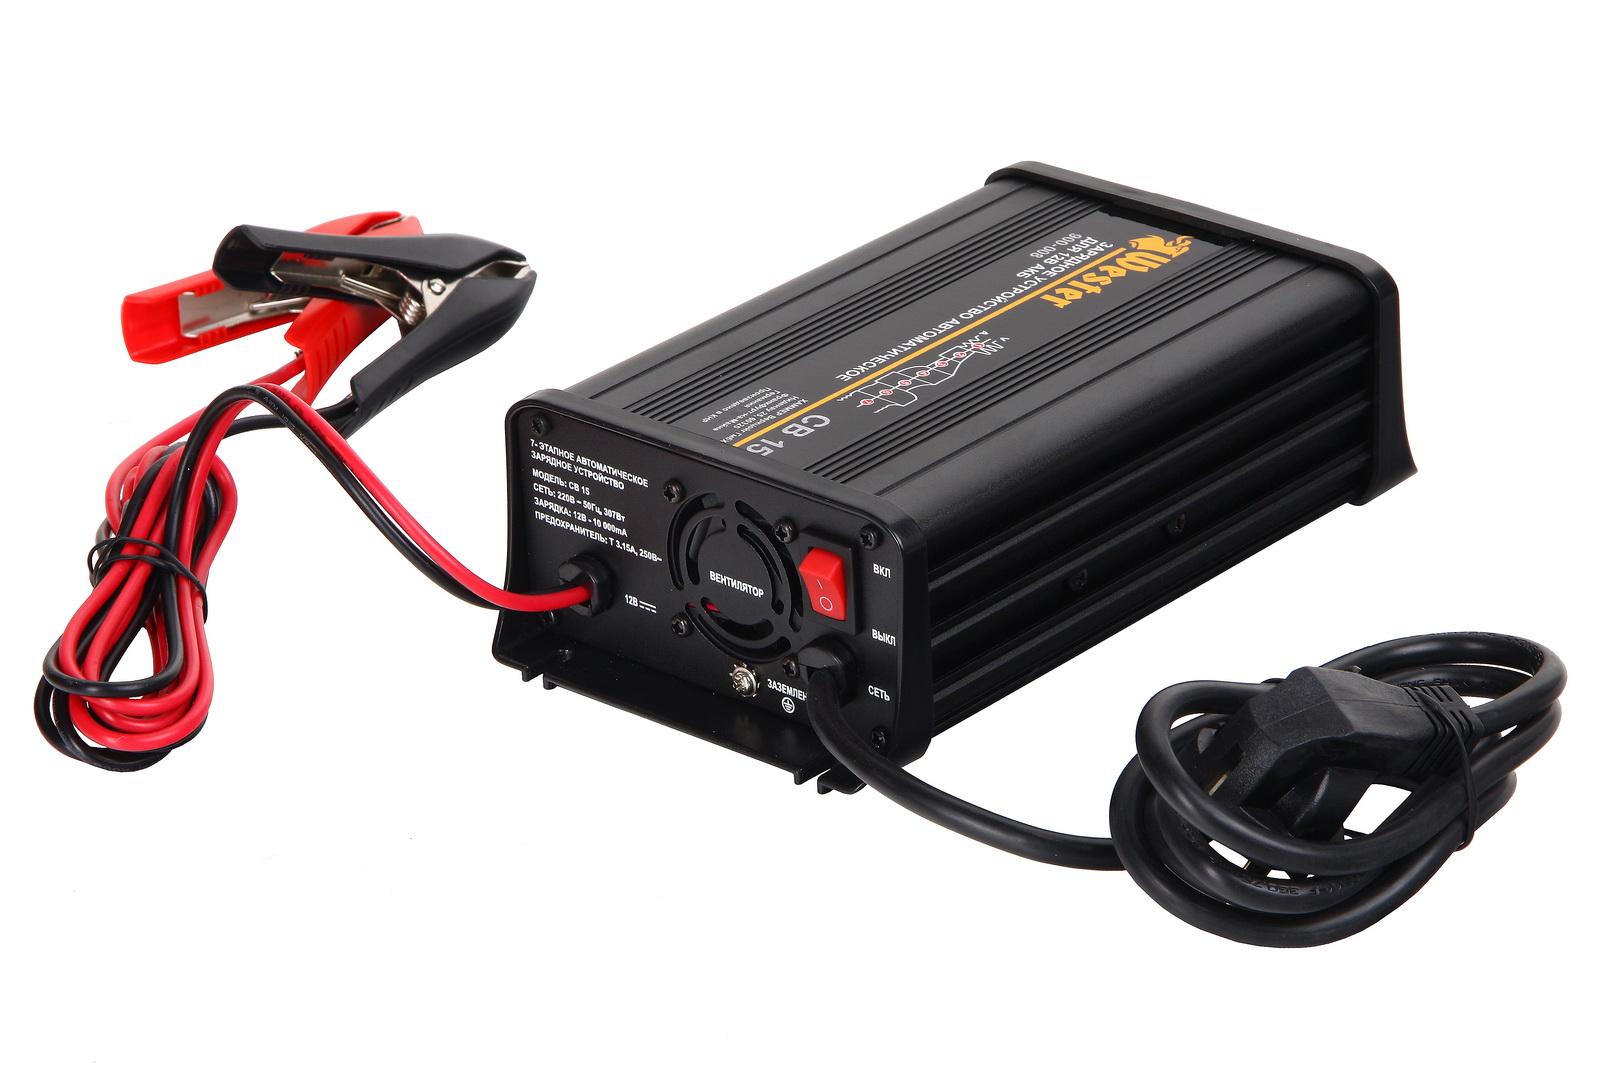 Устройство зарядное Wester СВ15 устройство зарядное wester ch20